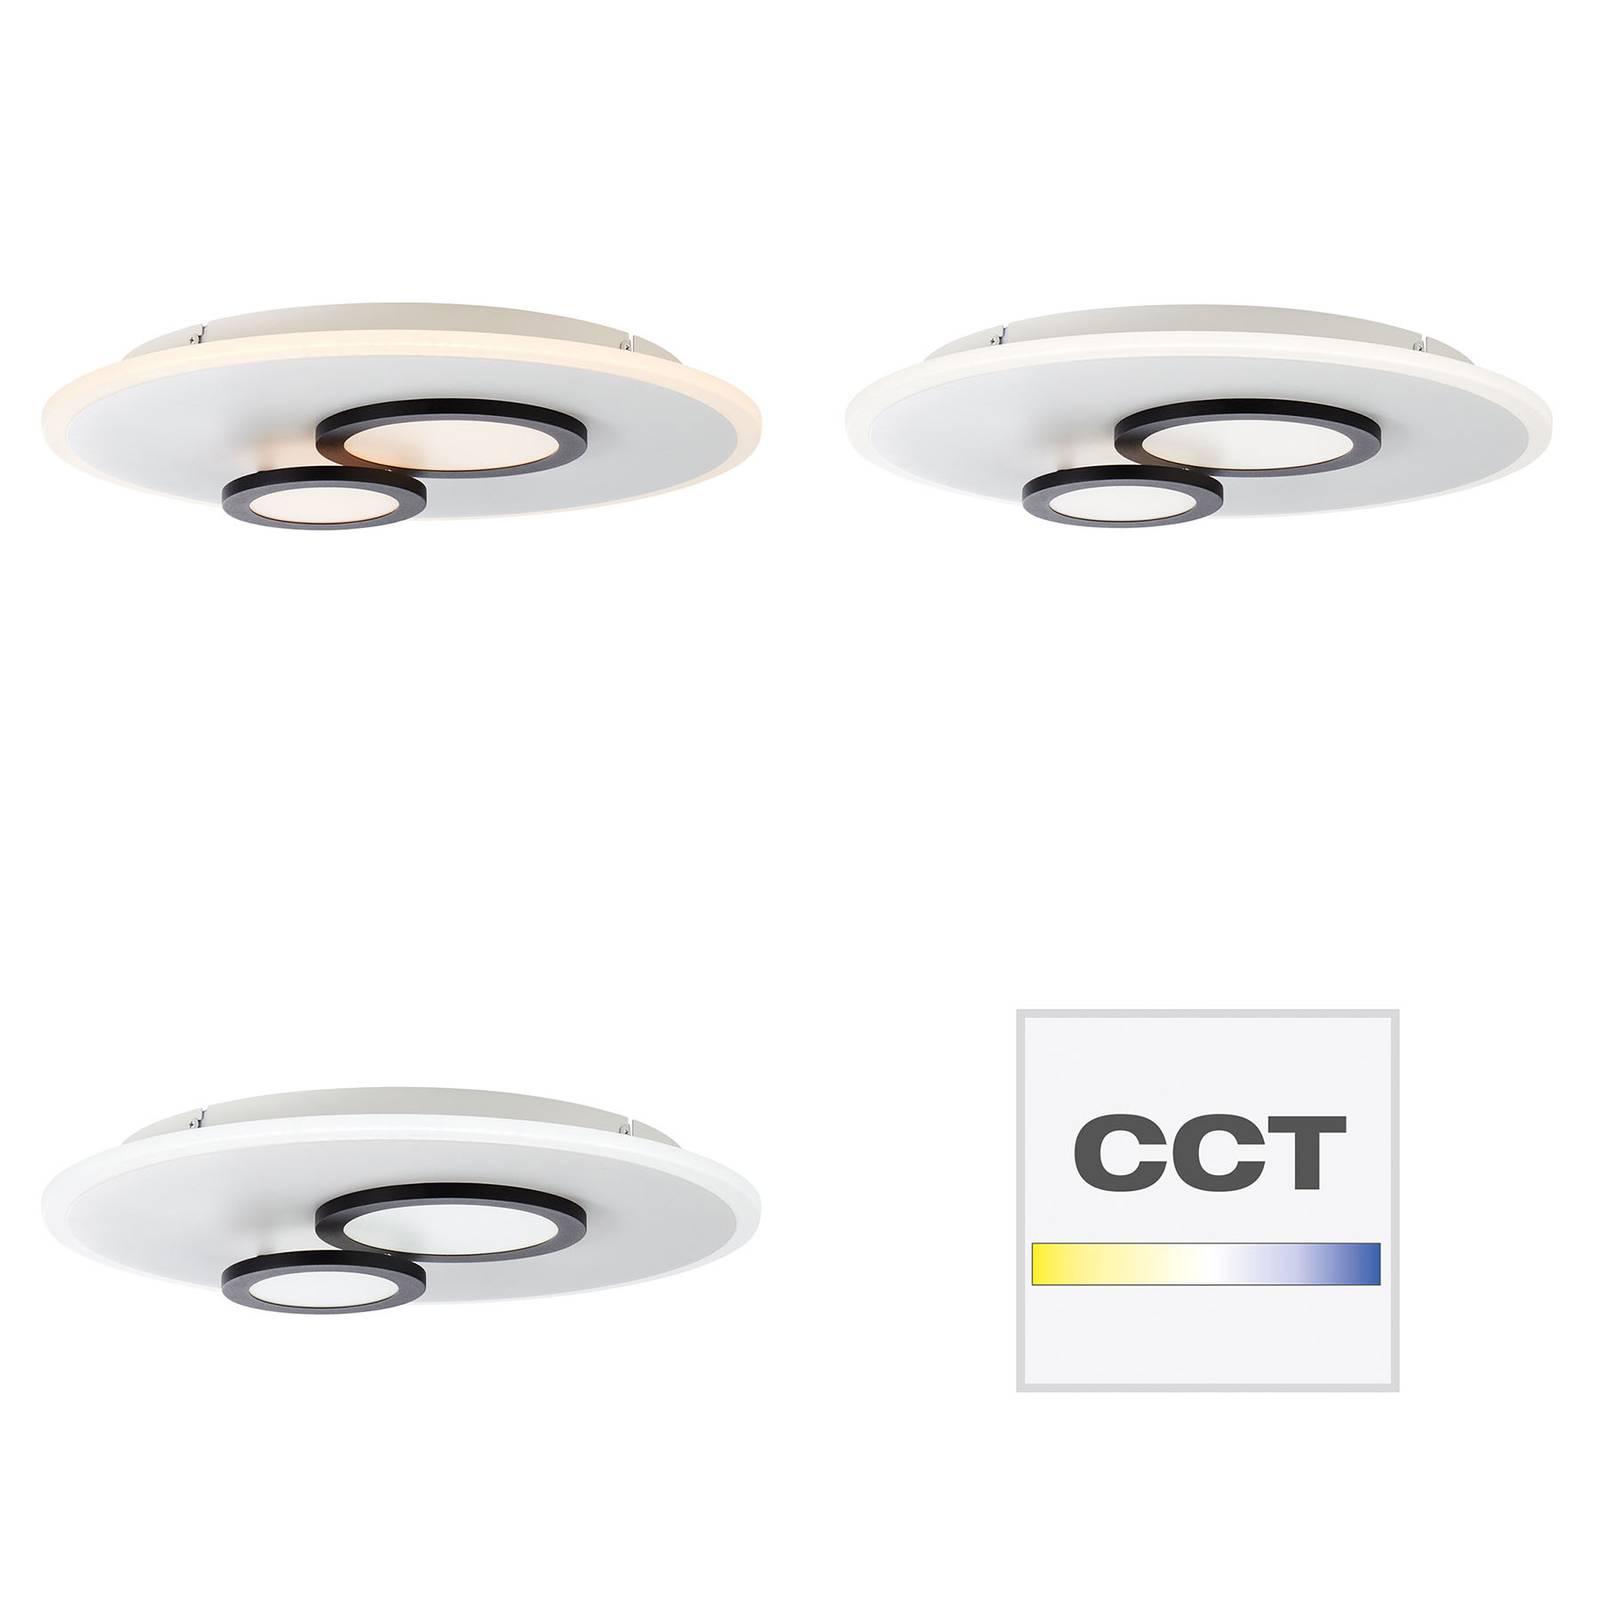 AEG Olia LED-Deckenleuchte, rund, CCT, dimmbar